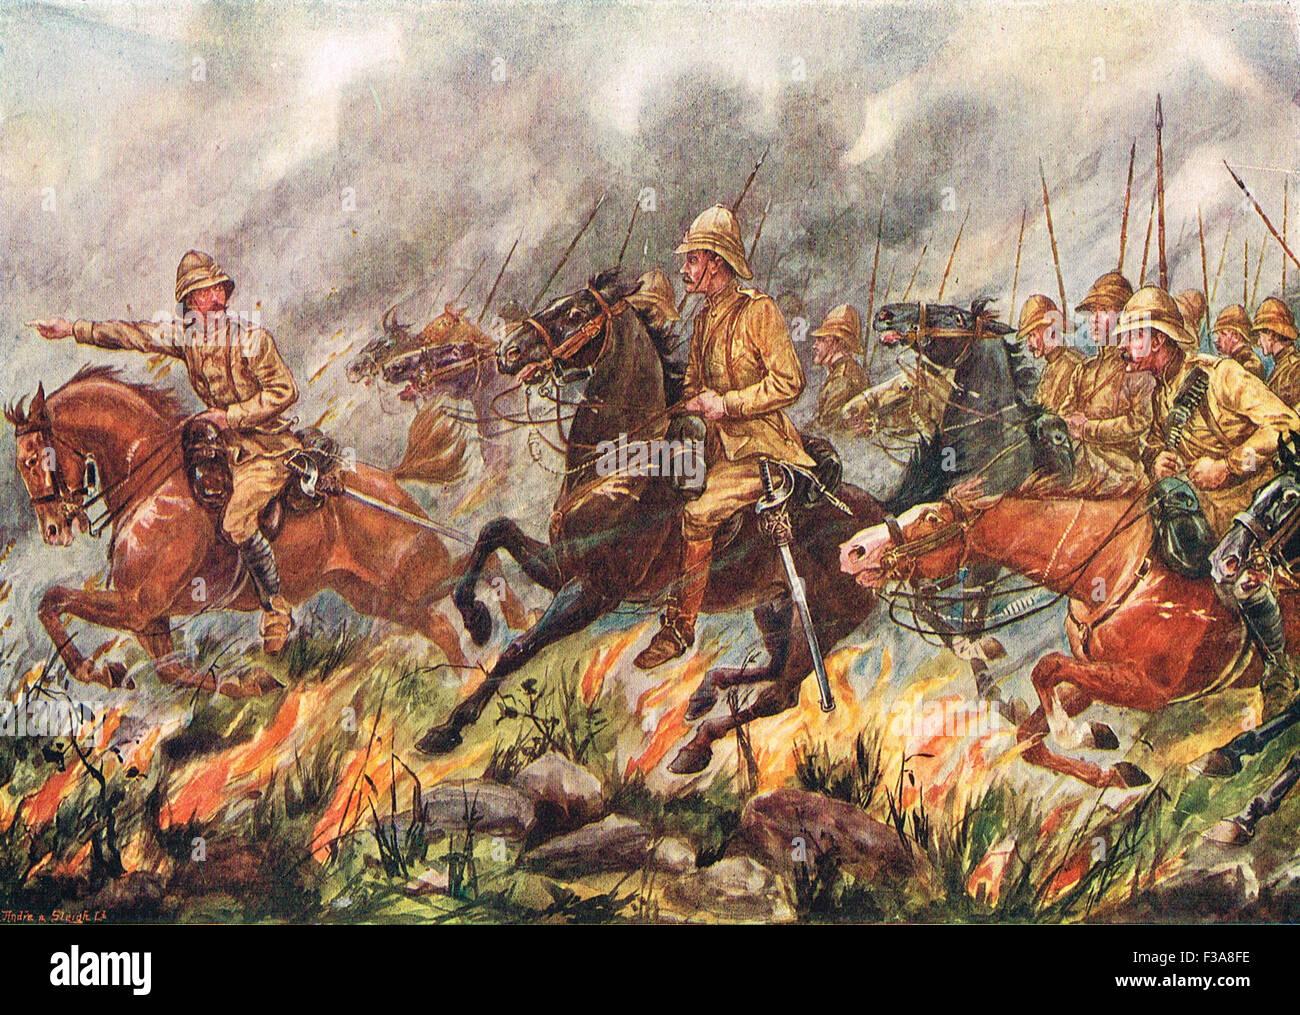 Lord Dundonald's ride flames Boer War - Stock Image